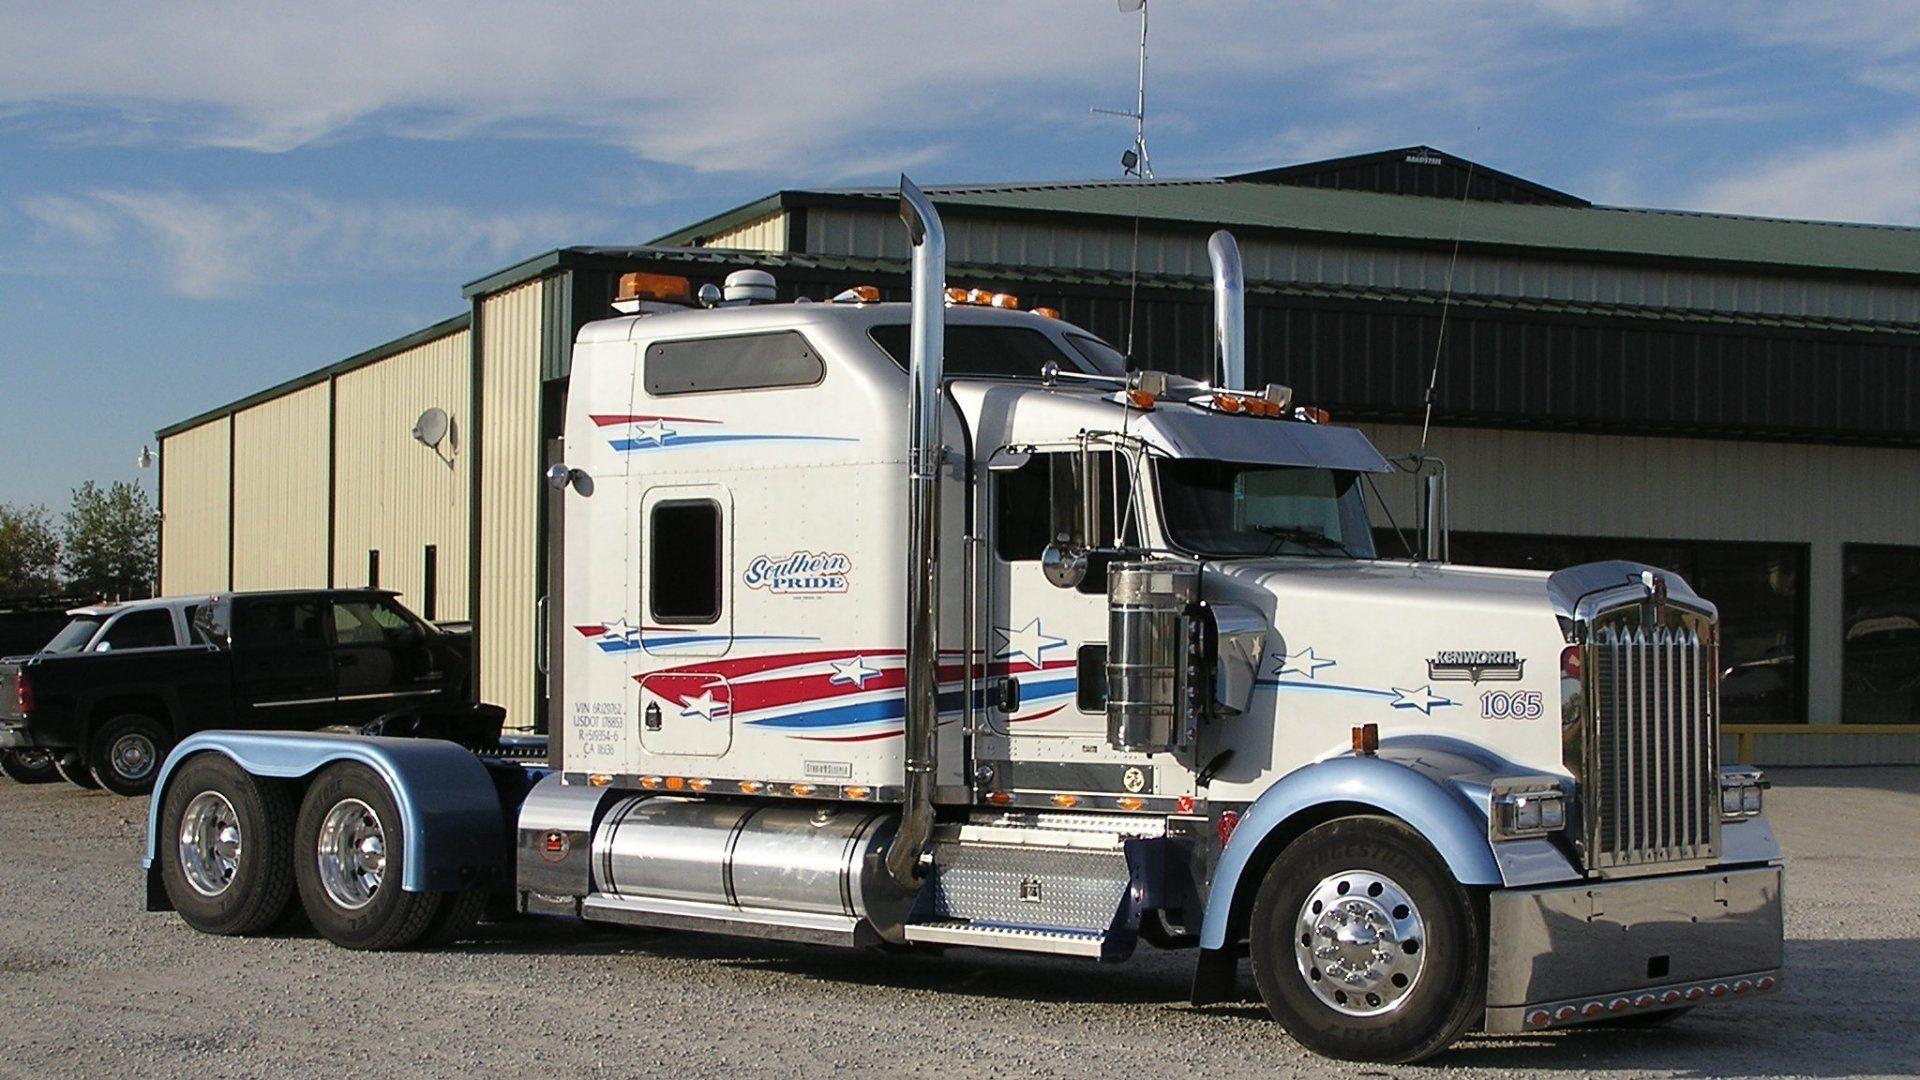 Pin By Desmond Du Randt On Cars Trucks Buses Etc Kenworth Trucks Kenworth Trucks